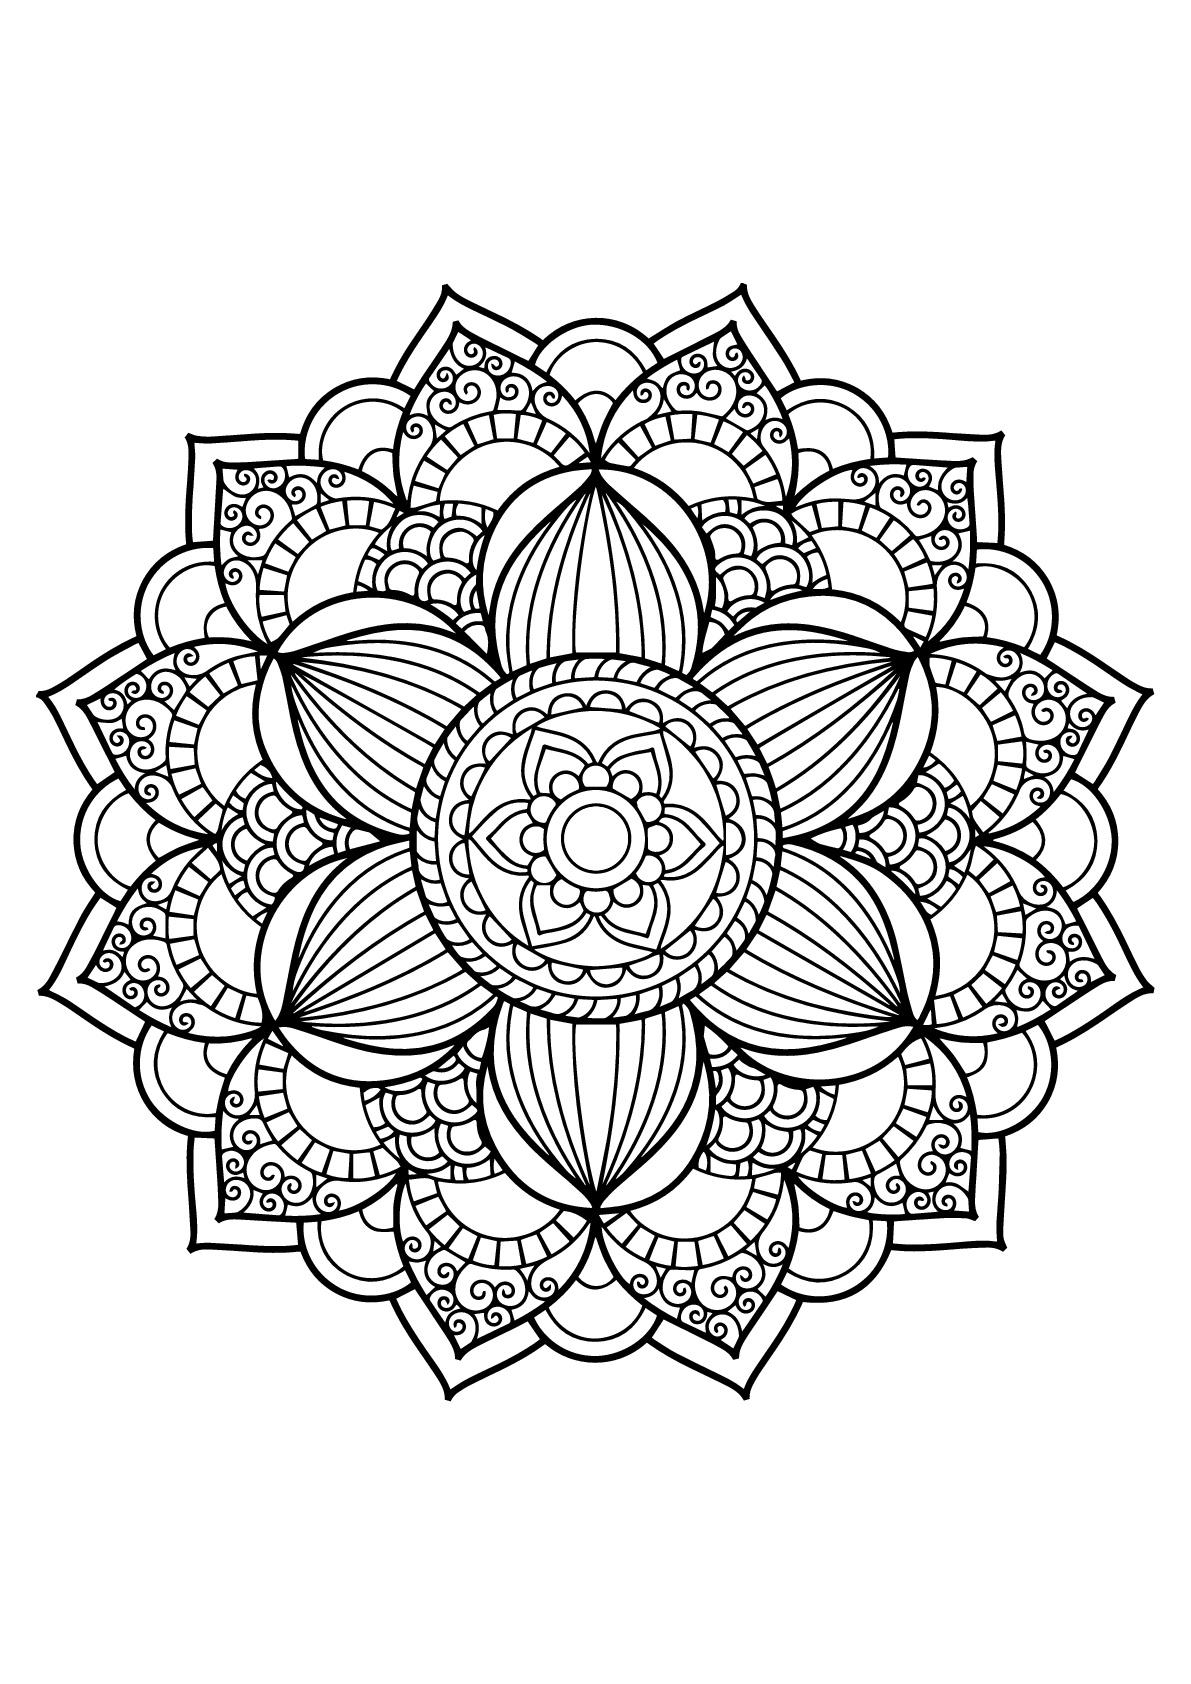 Colorear para adultos  : Mandalas - 17